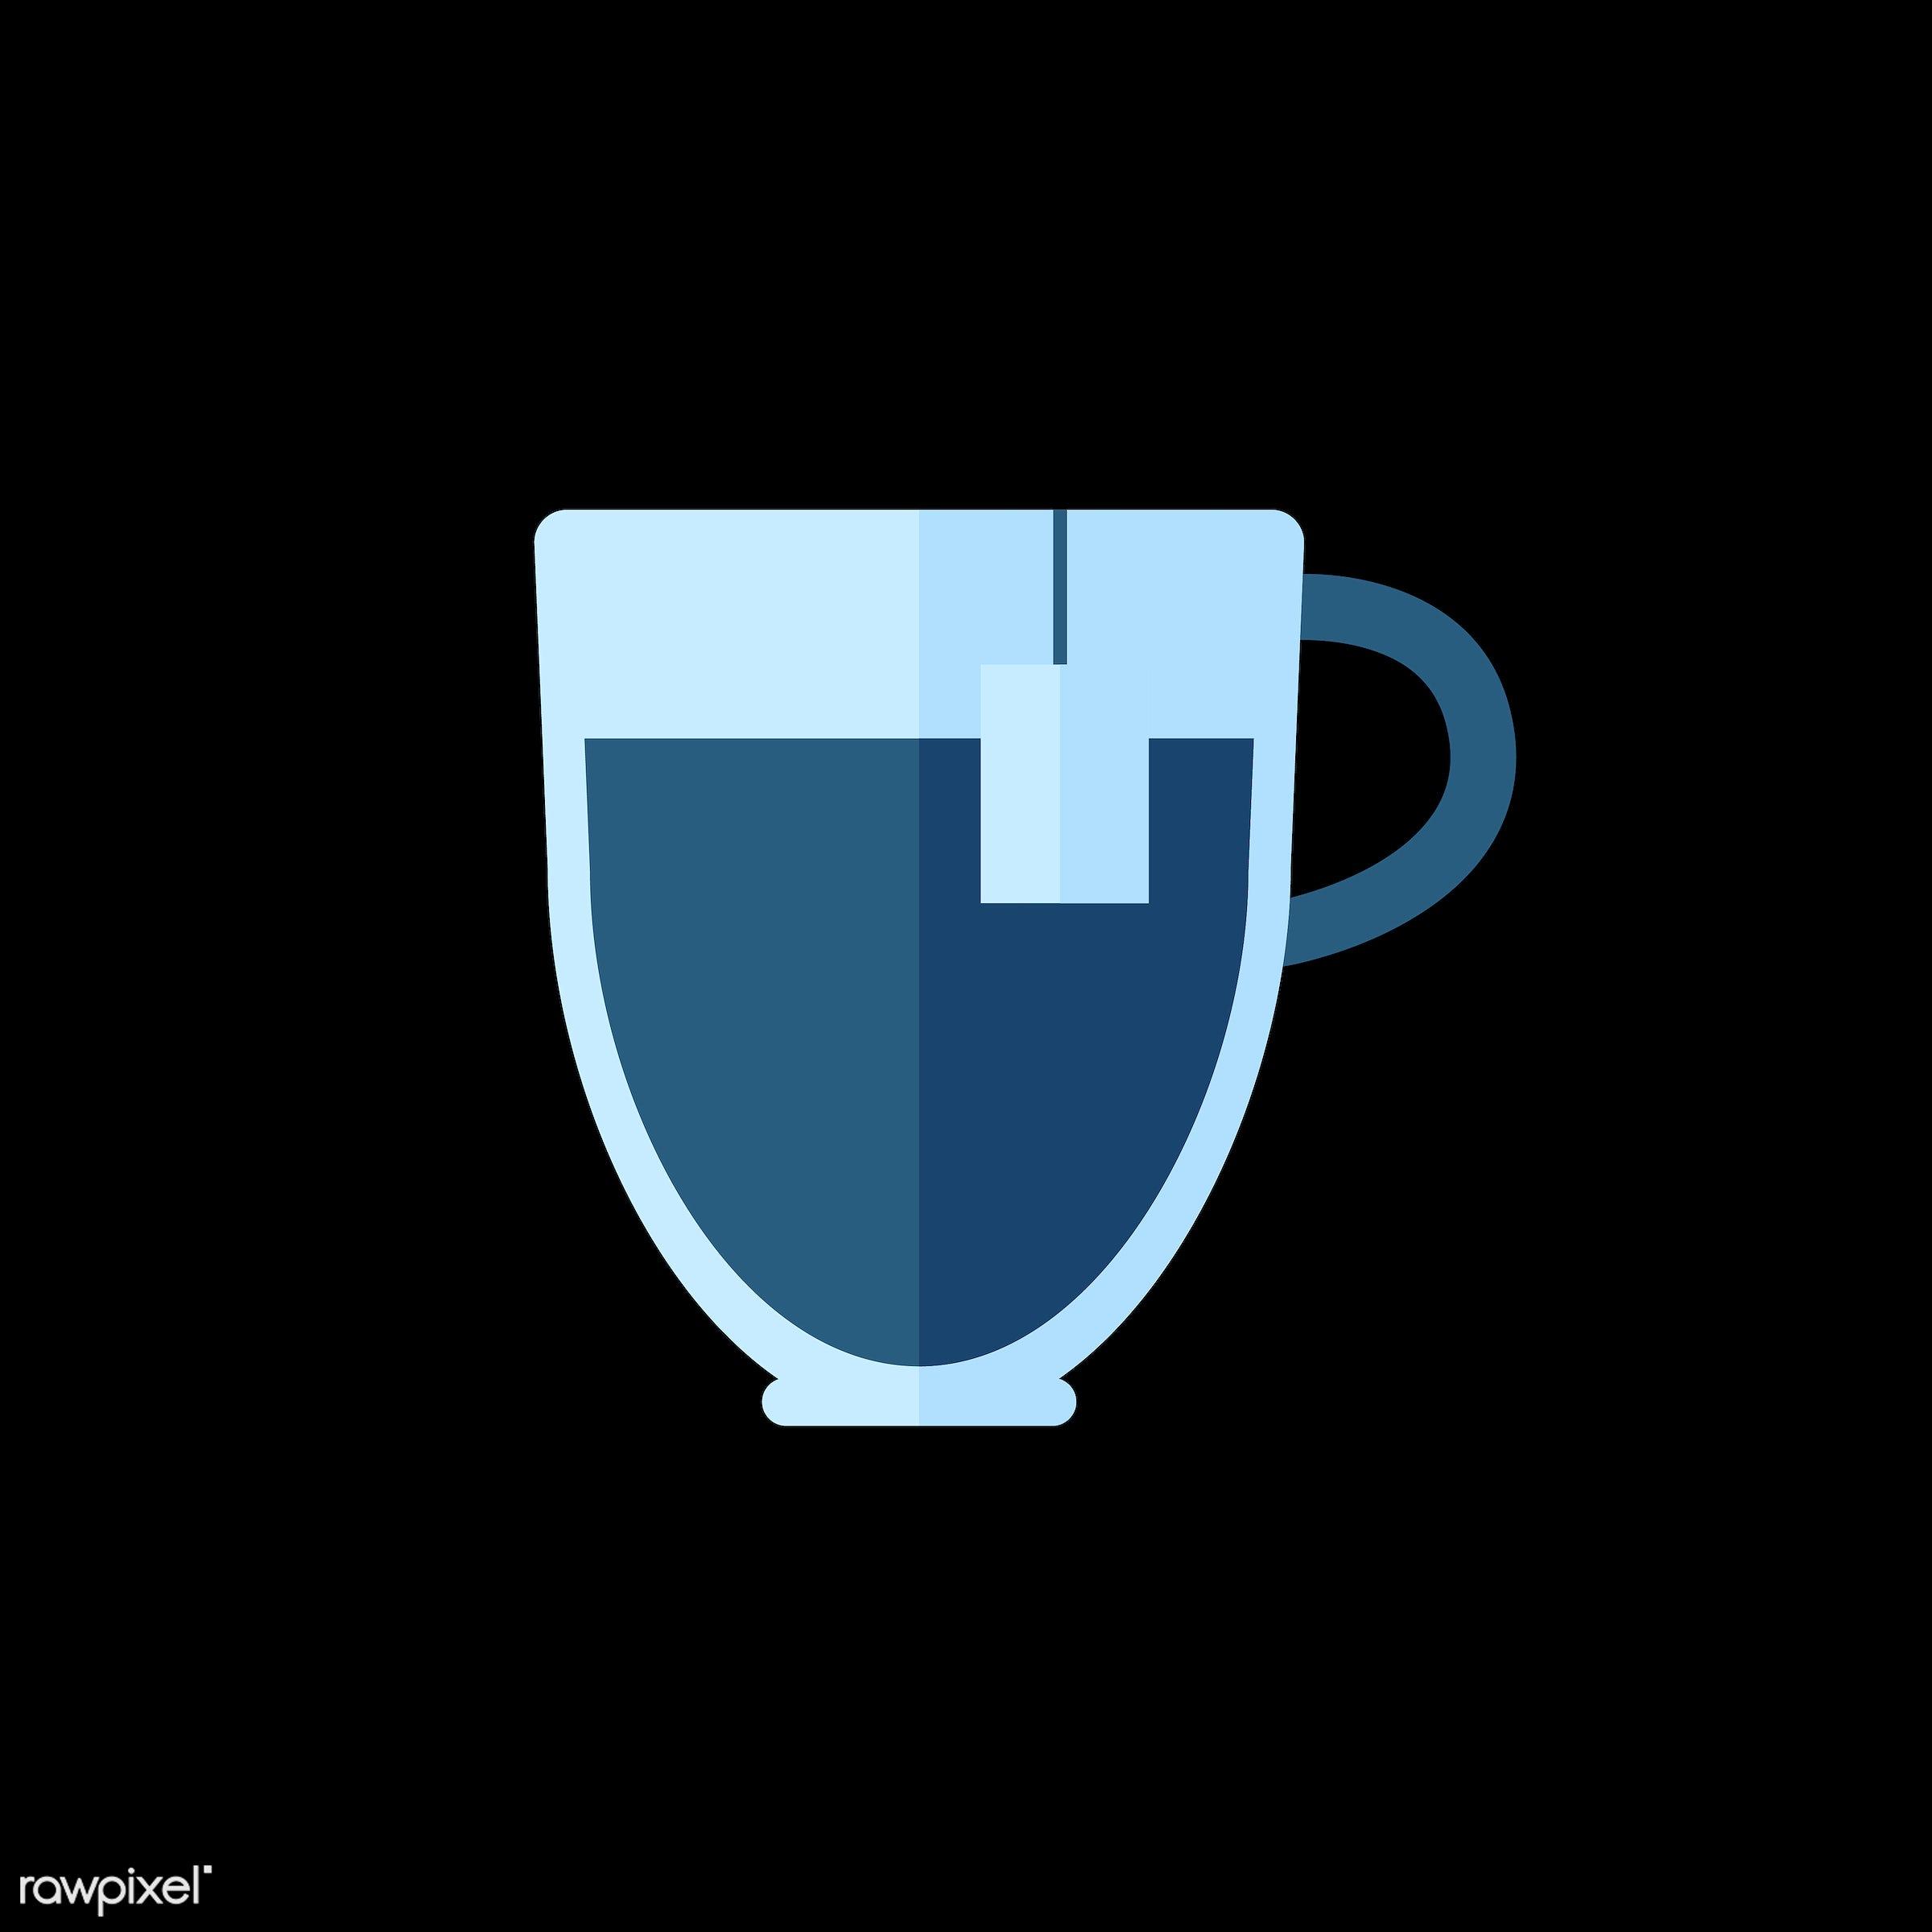 vector, graphic, illustration, icon, symbol, colorful, cute, mug, tea, tea cup, hot drink, drink, beverage, water, blue